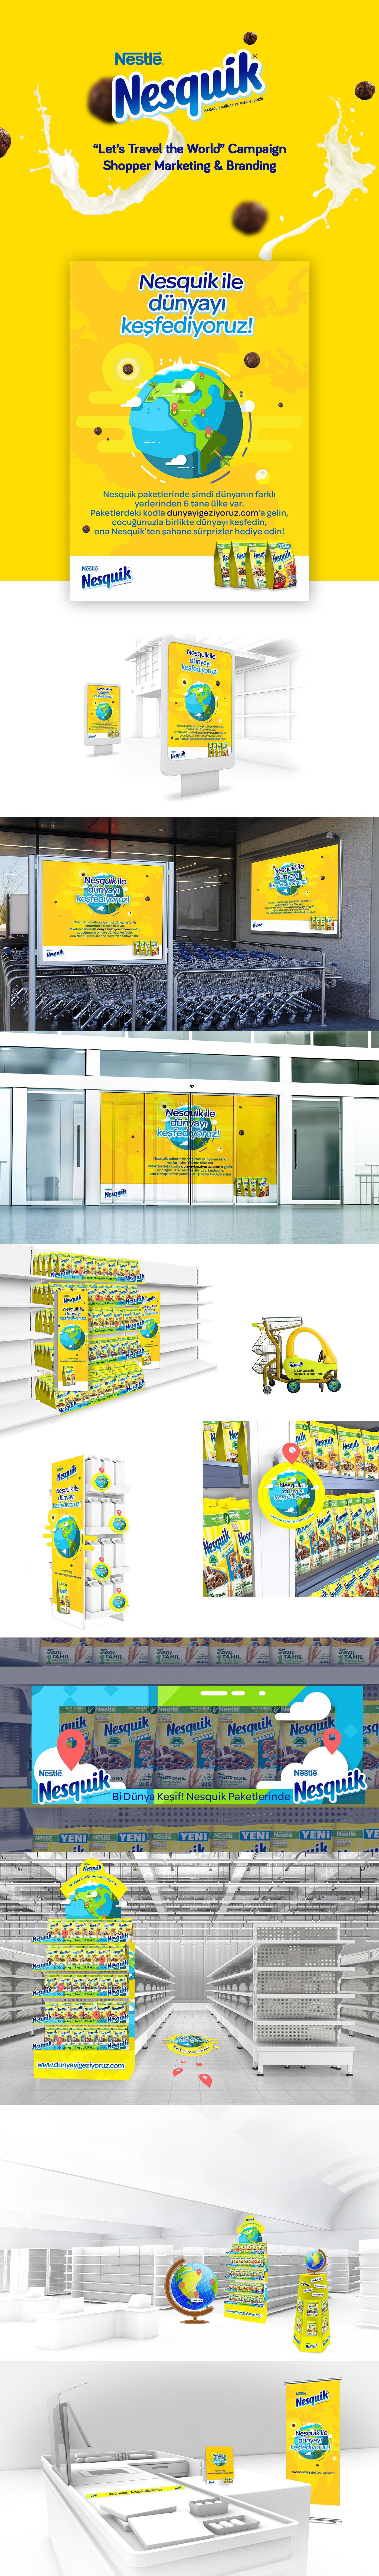 nestle Nesquik shopper marketing activation Supermarket Supermarket Branding Shopping